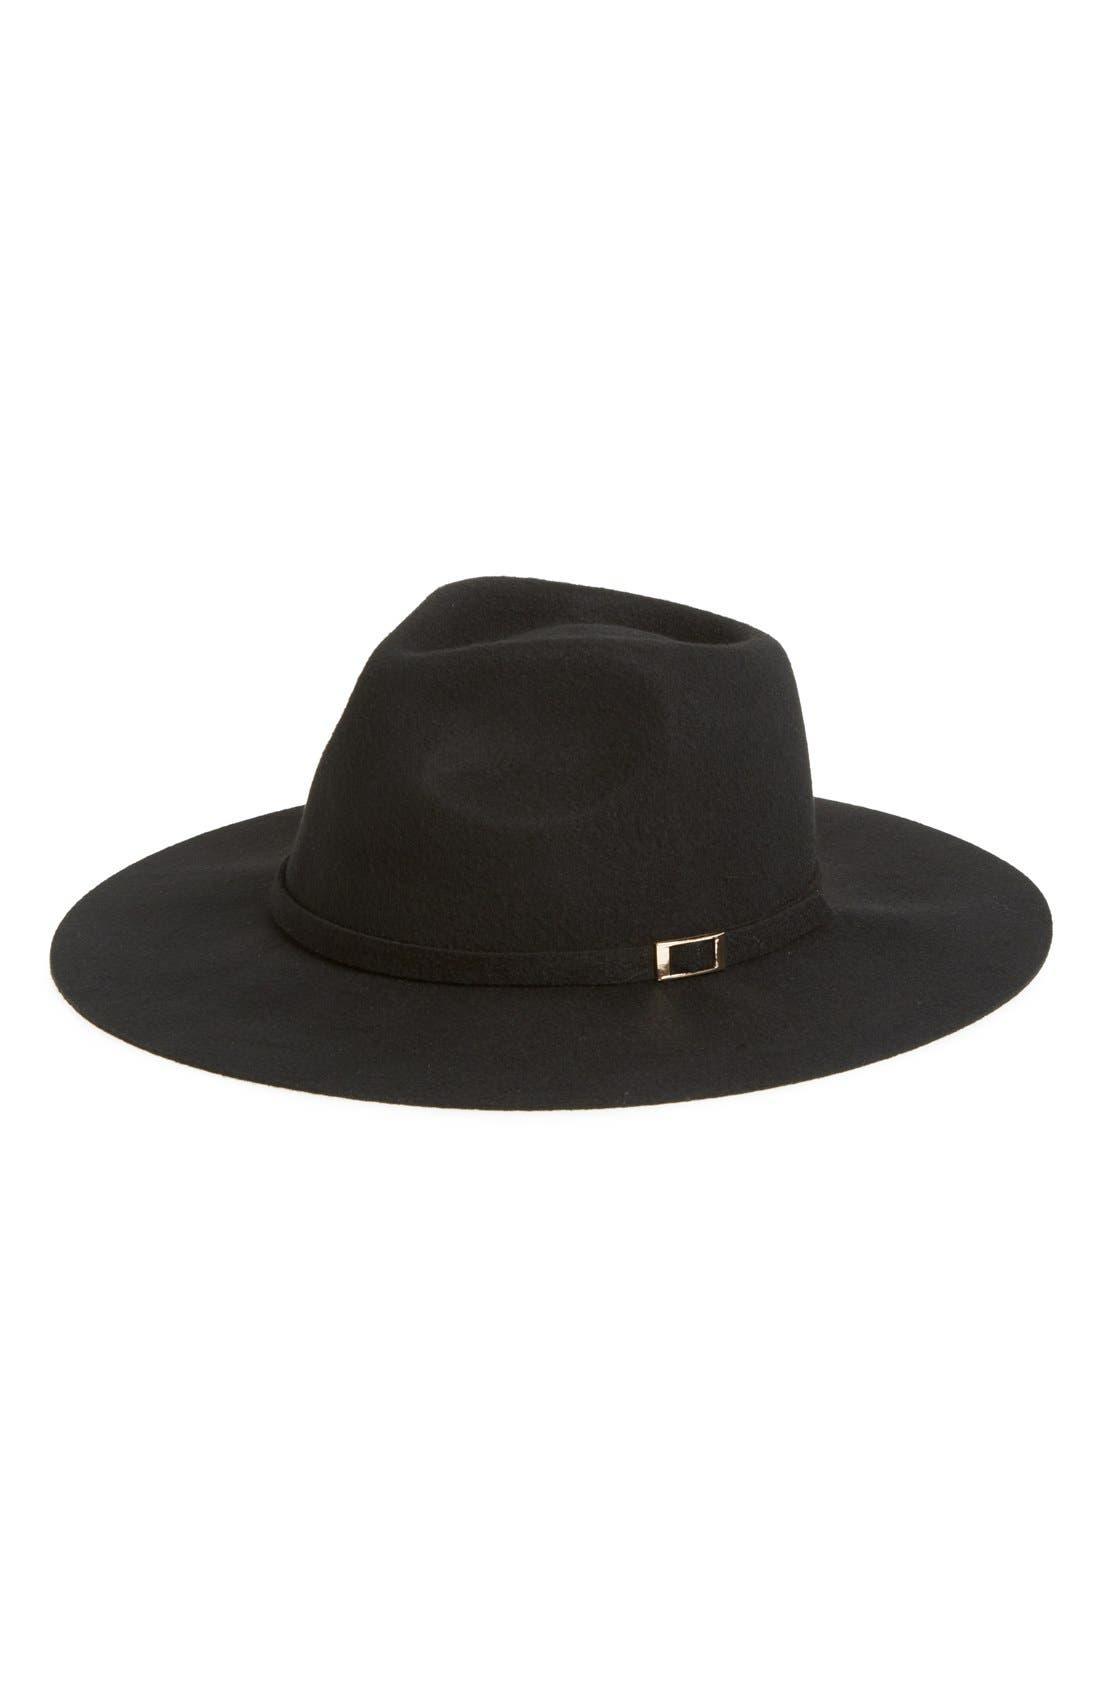 Alternate Image 1 Selected - Shiraleah 'Yves' Wool Hat